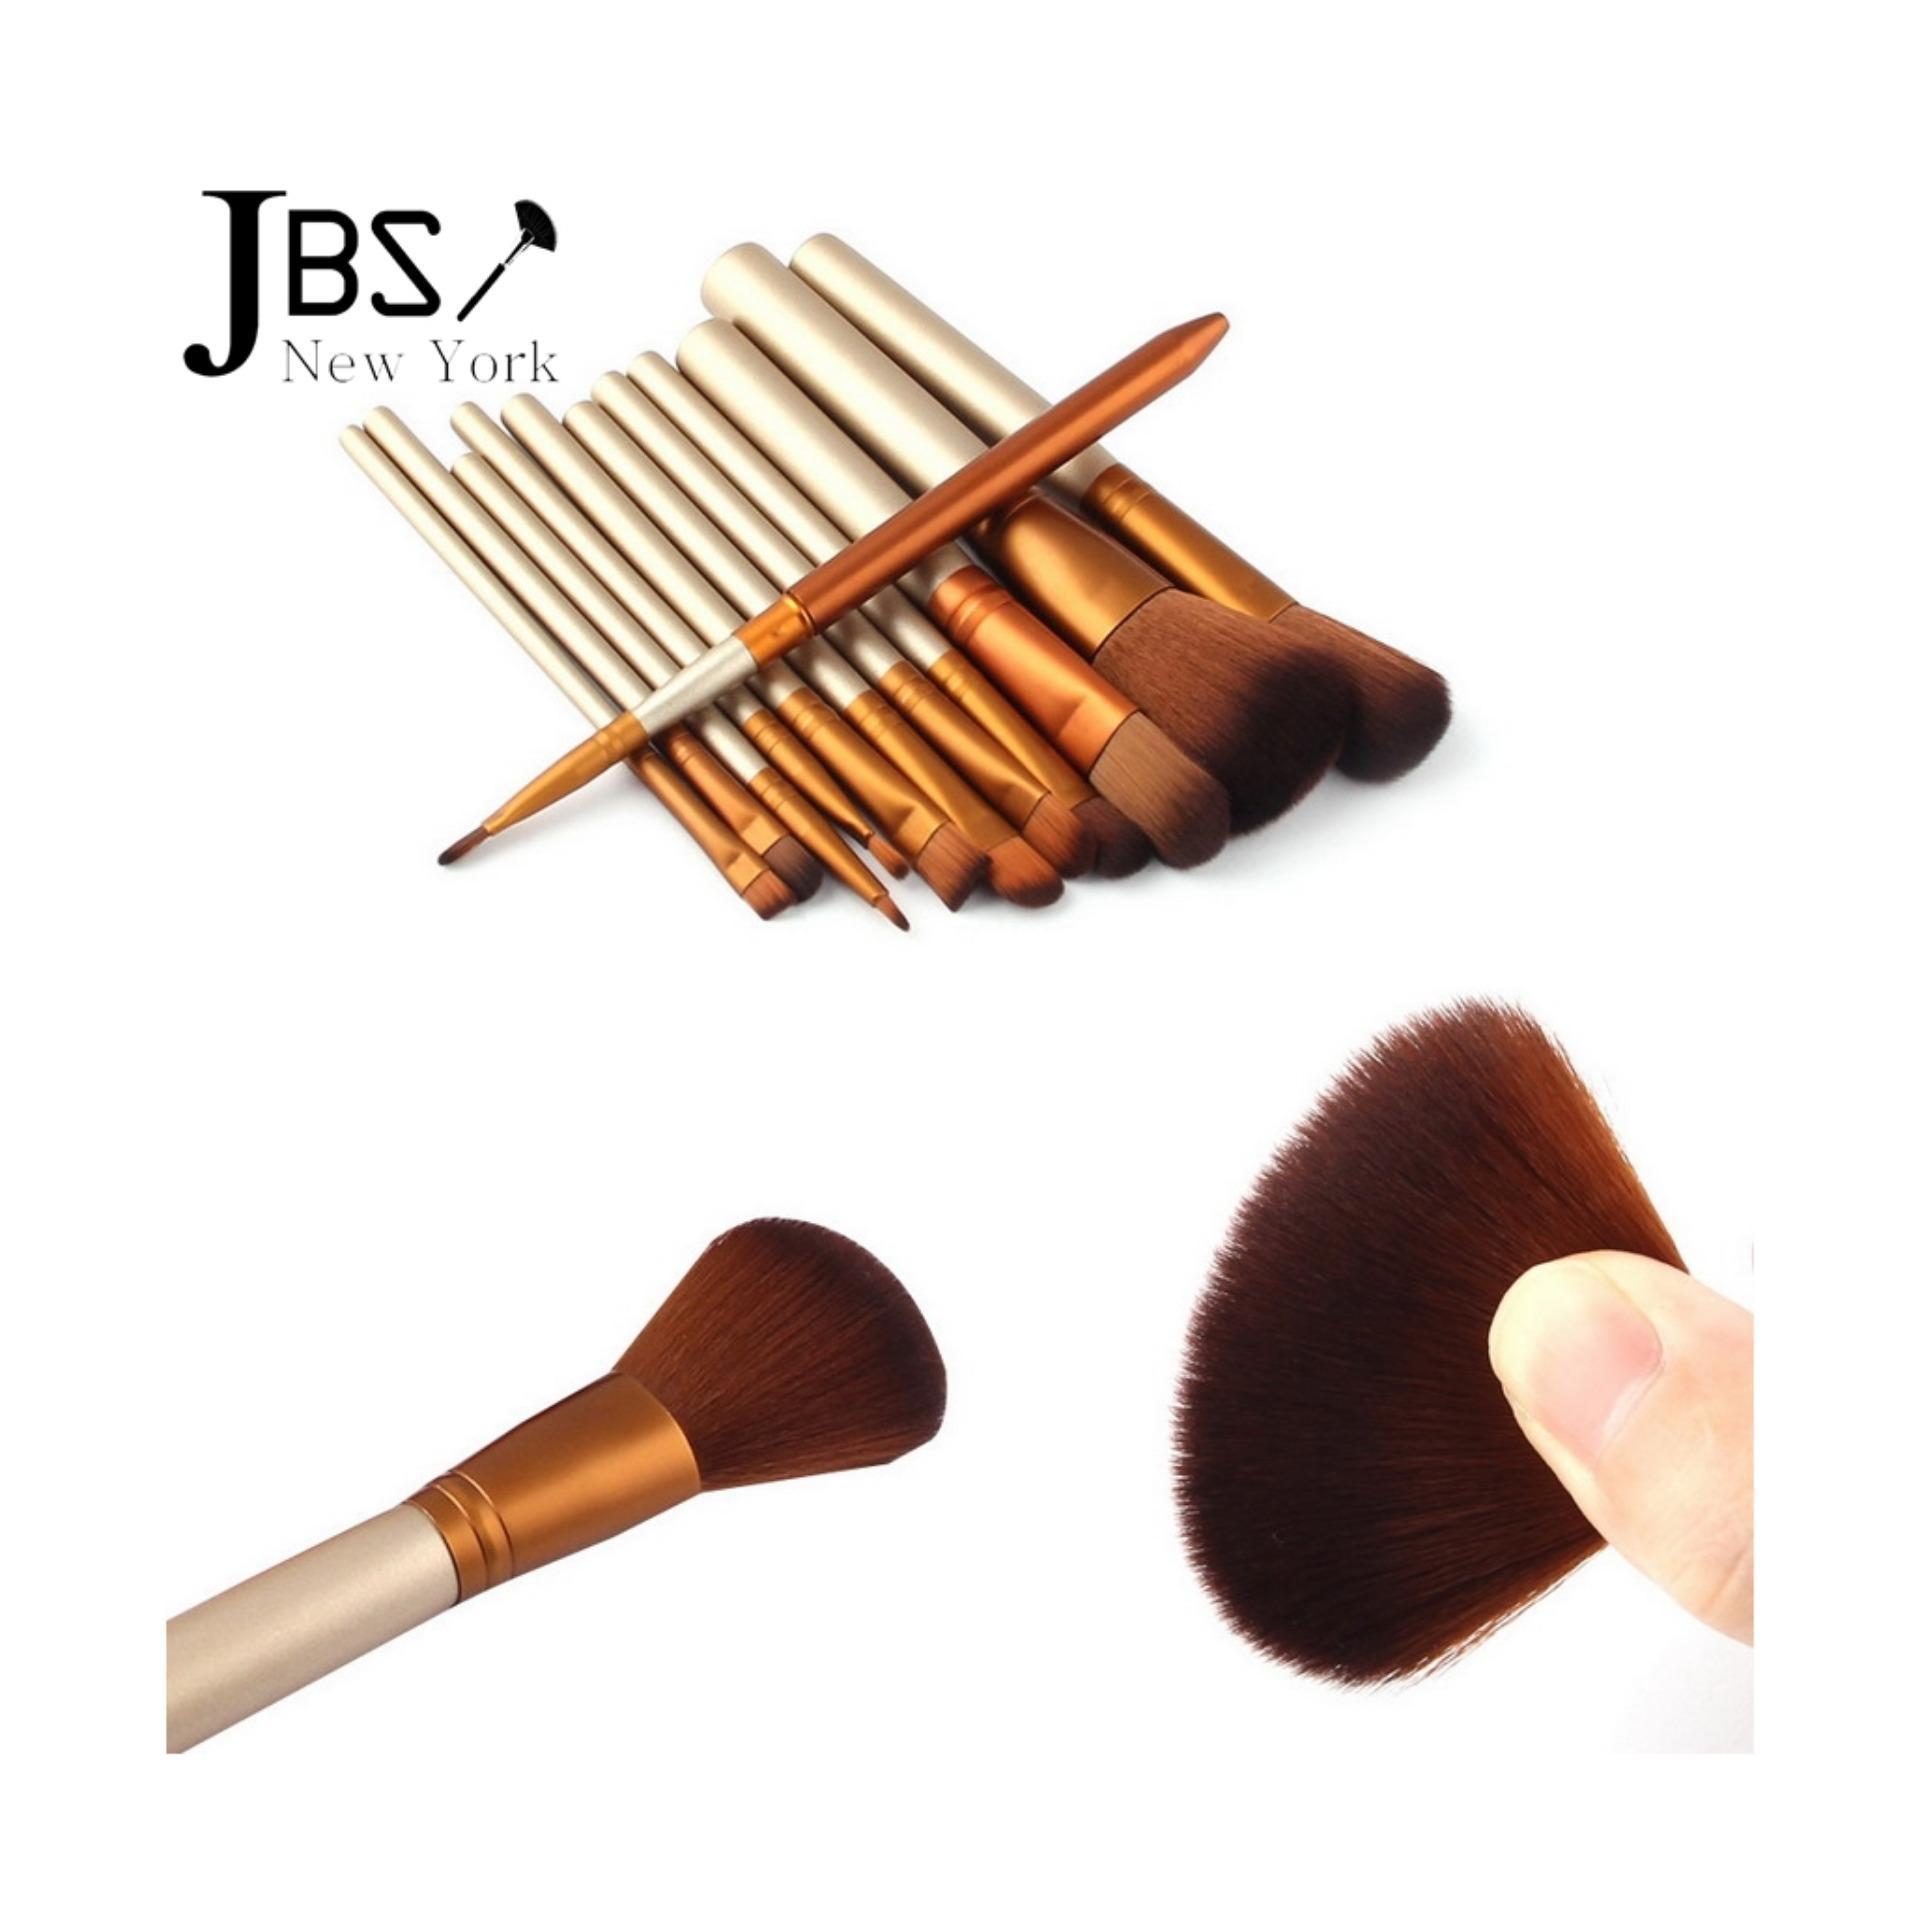 Beli Jbs New York Makeup Brush Profesional Kuas 12 N5 Set Hello Kitty Kaleng 7 Pcs Nkd